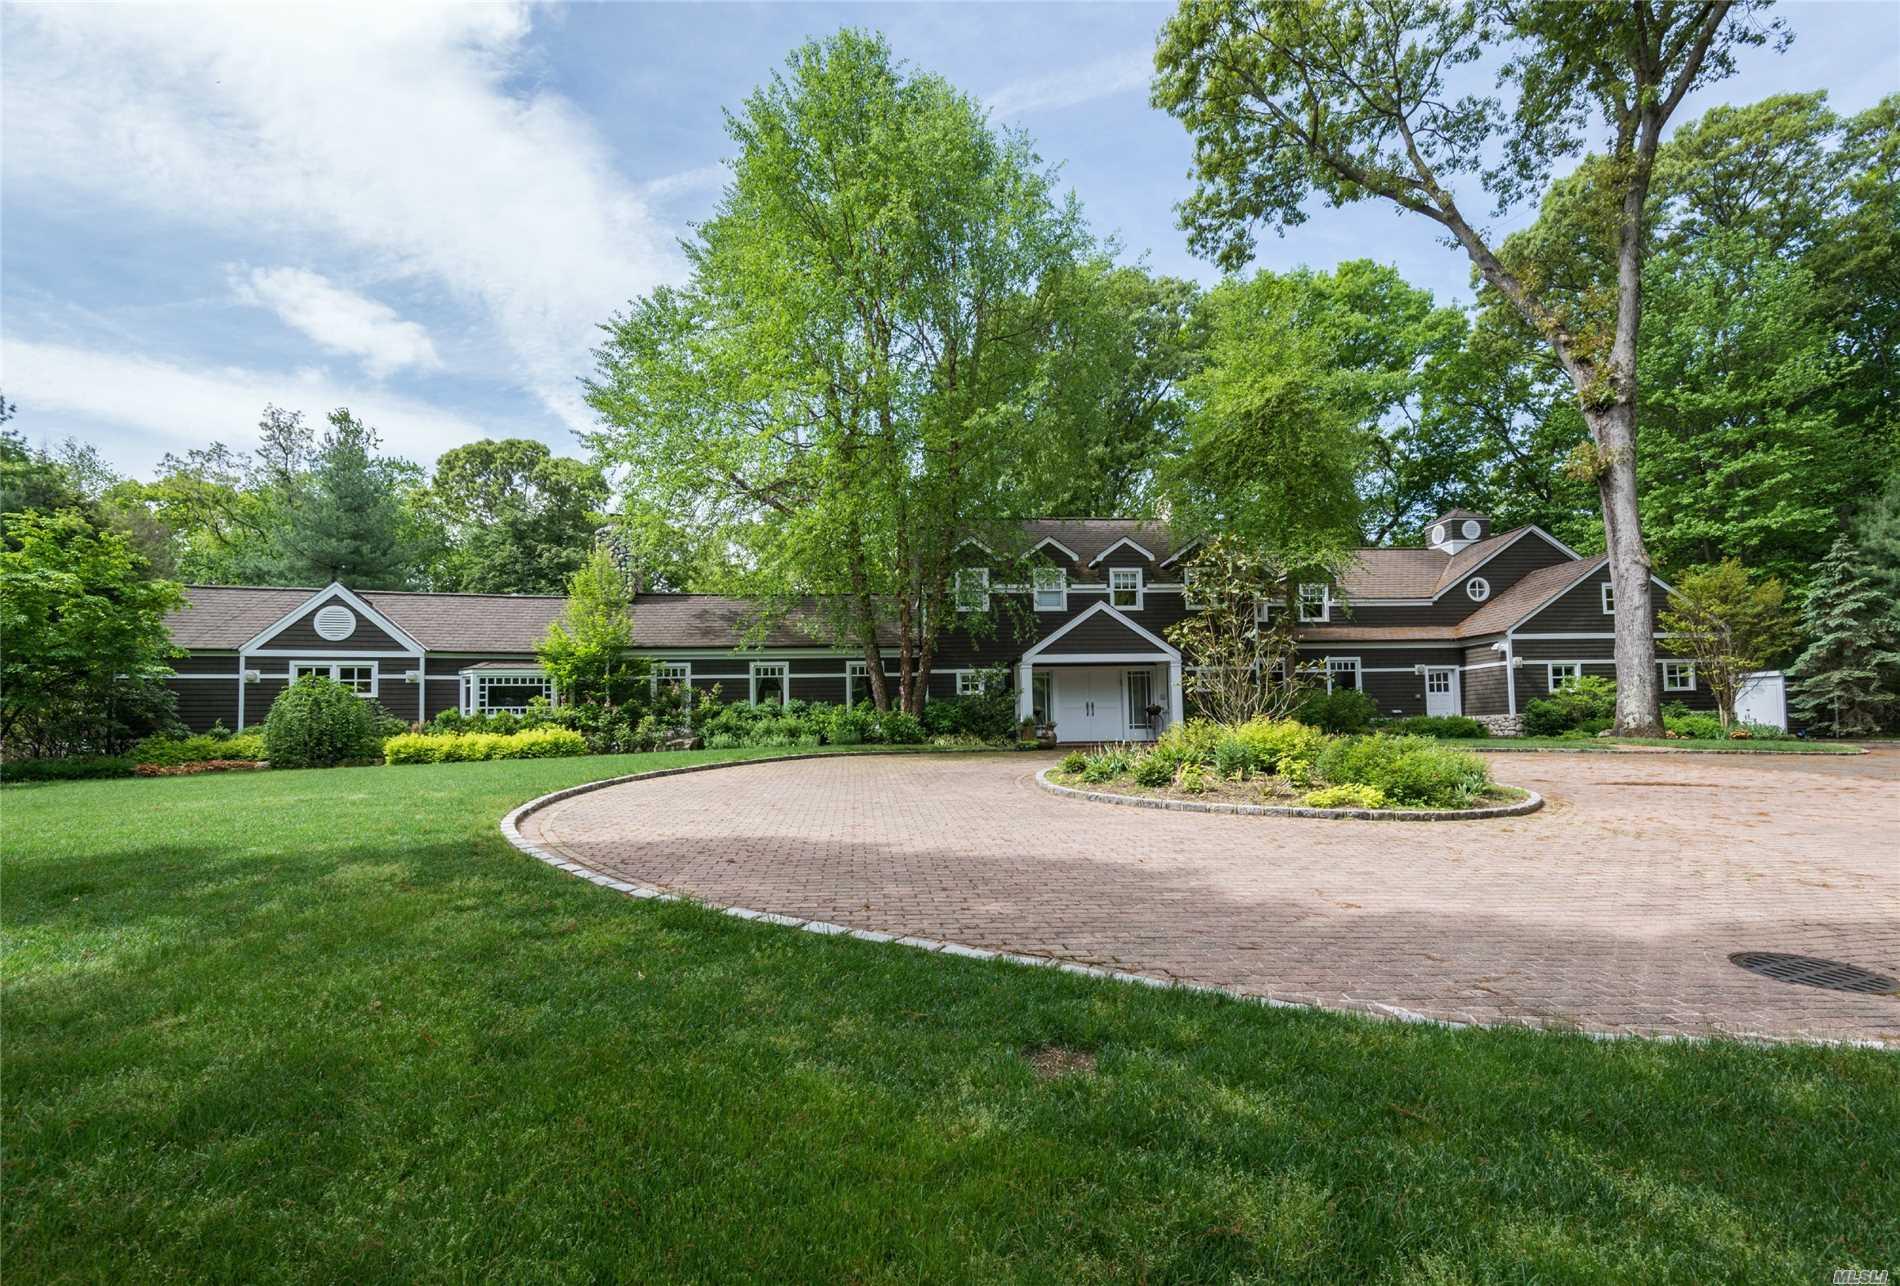 Property for sale at 1620 Old Cedar Swamp Rd, Brookville,  NY 11545